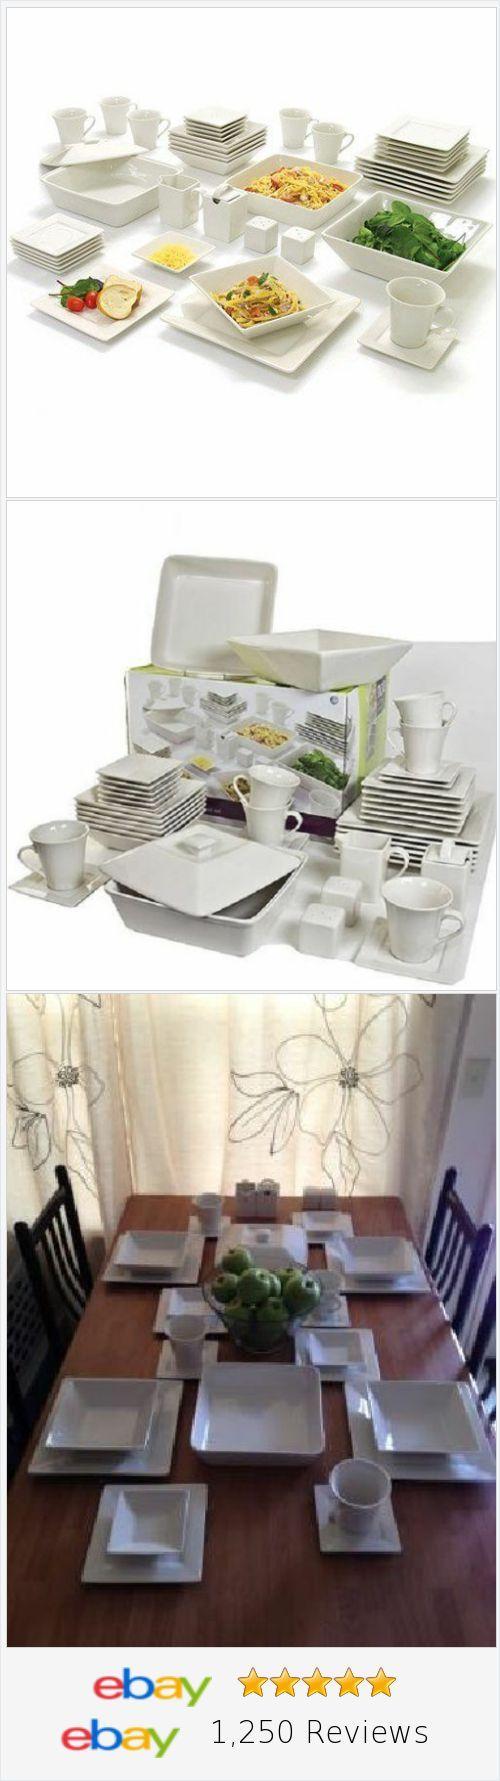 17 best ideas about white dinnerware on pinterest | white plates